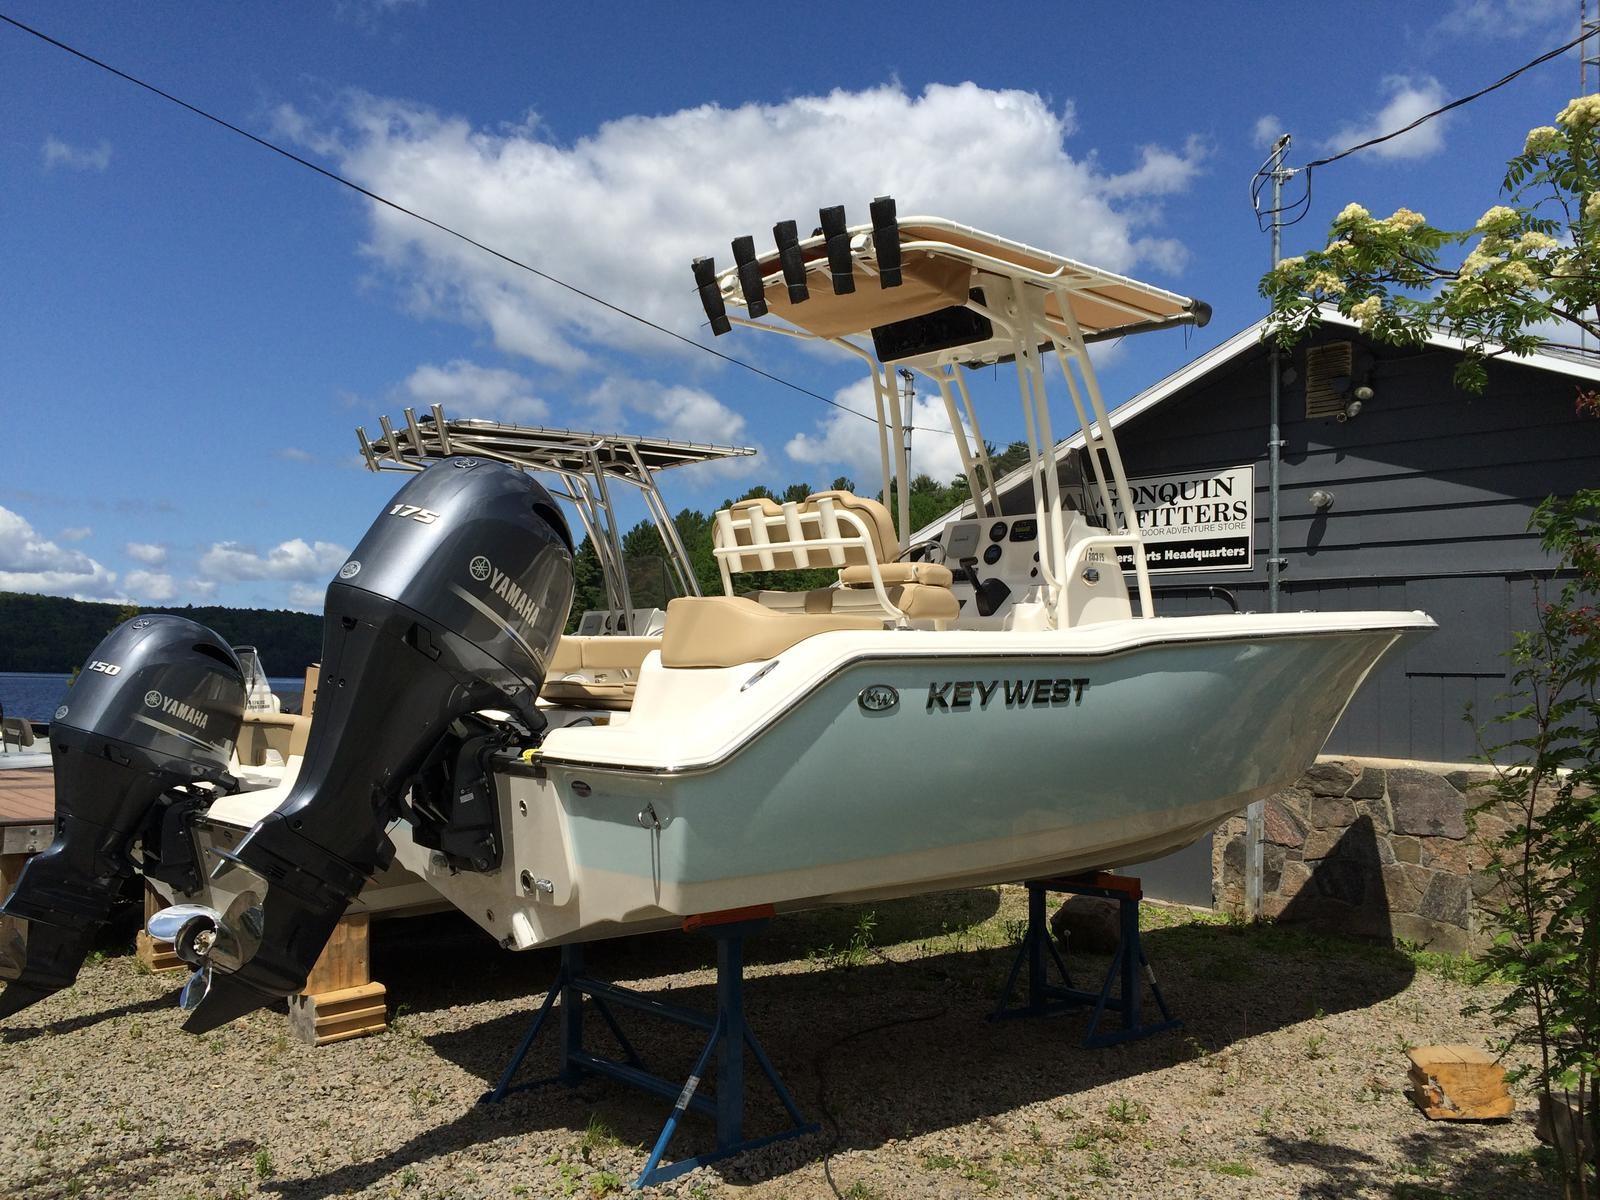 Key west boat dealers in michigan city